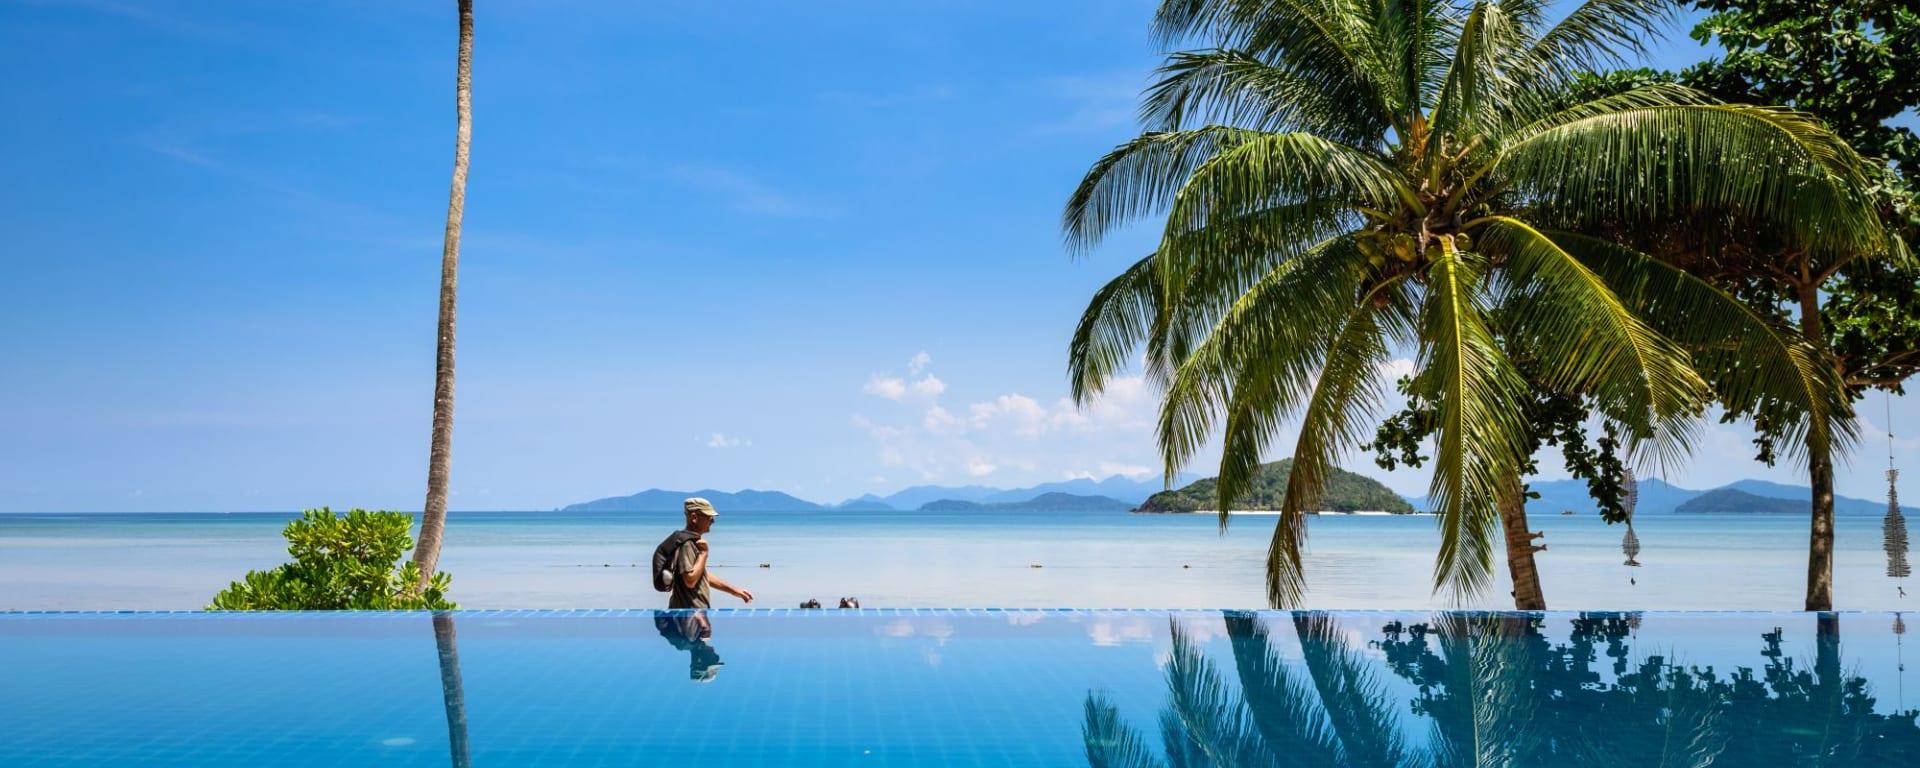 D'île en île dans le golfe de Thaïlande en individuel de Ko Chang: pool: Pool at Seavana Resort